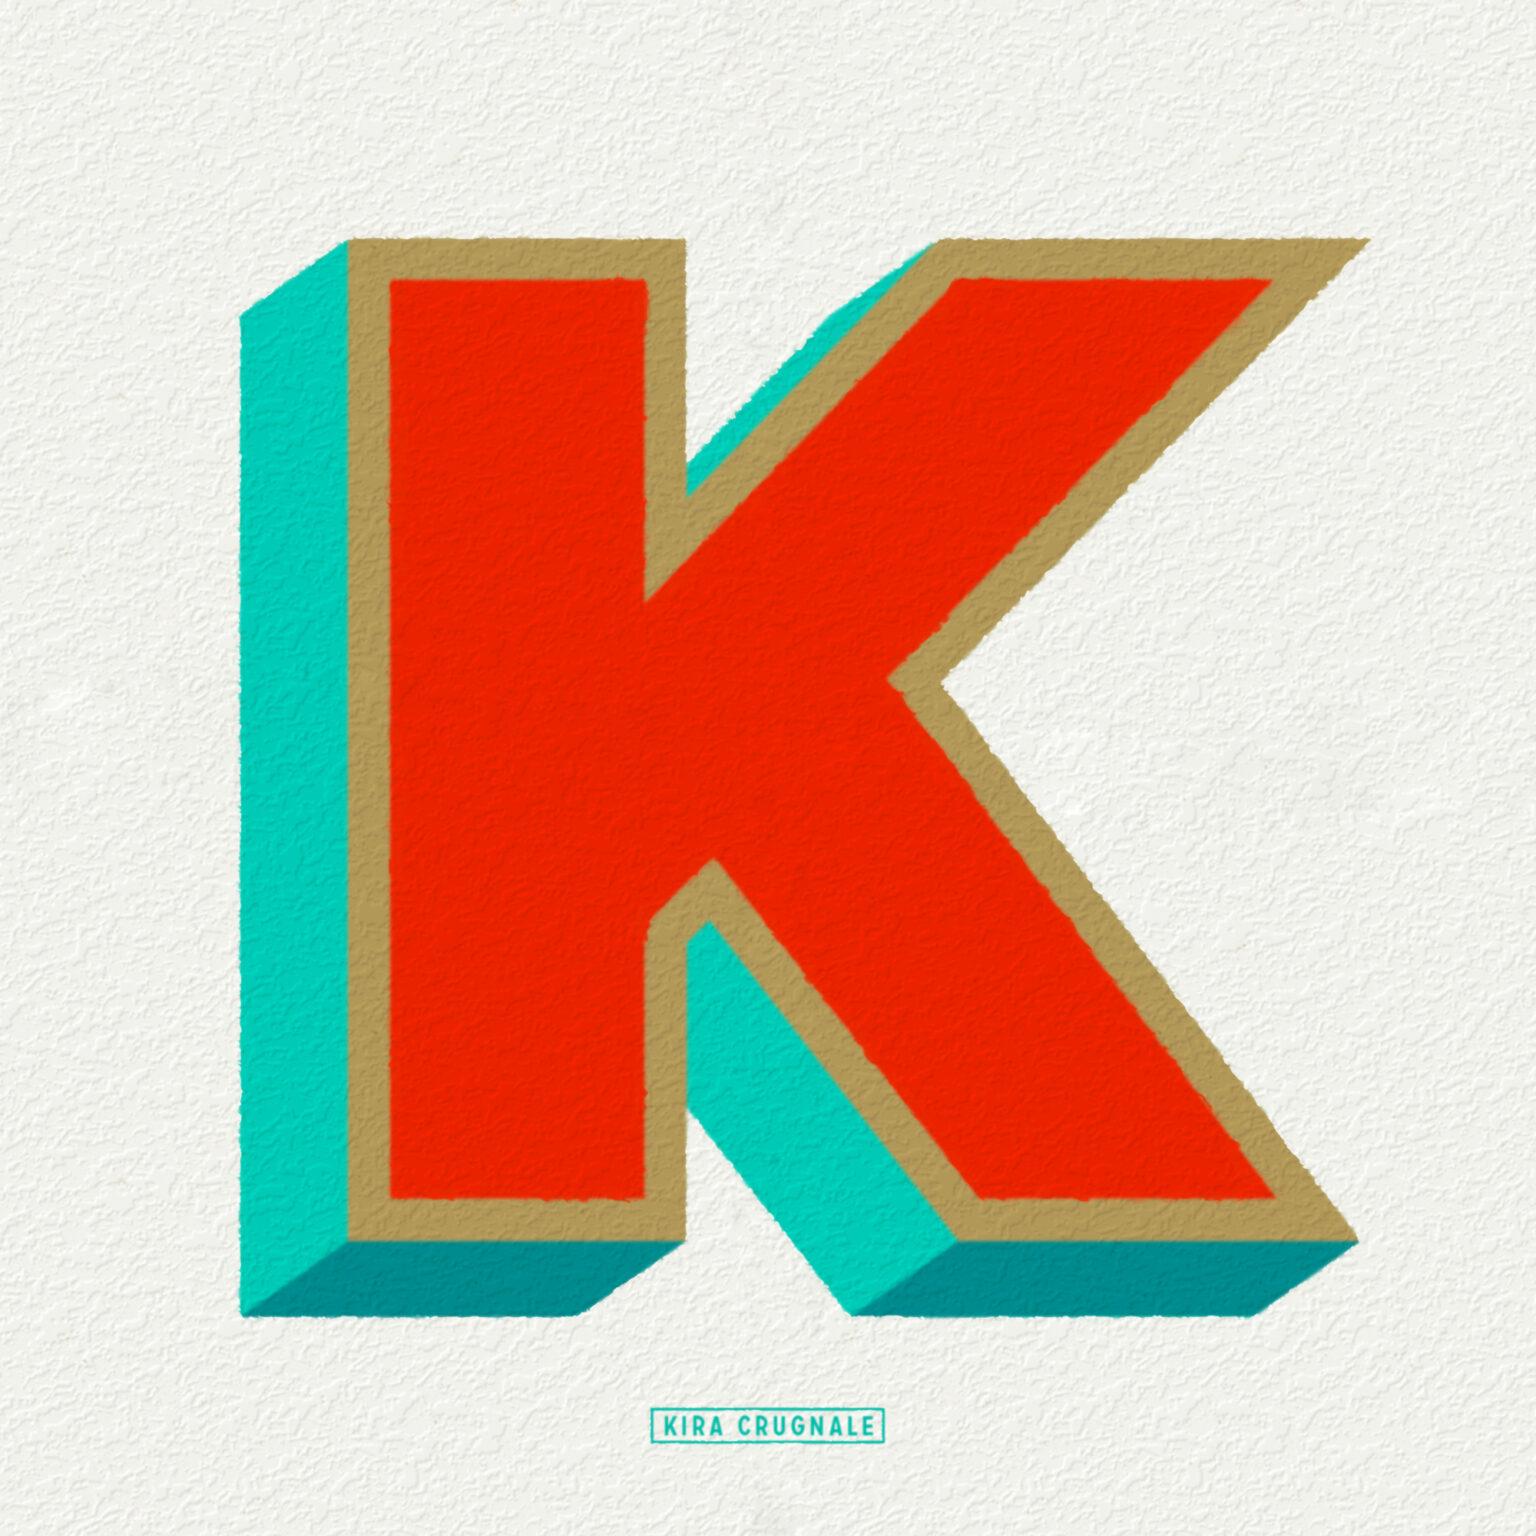 ATC Artist Series Kira Crugnale Letter K